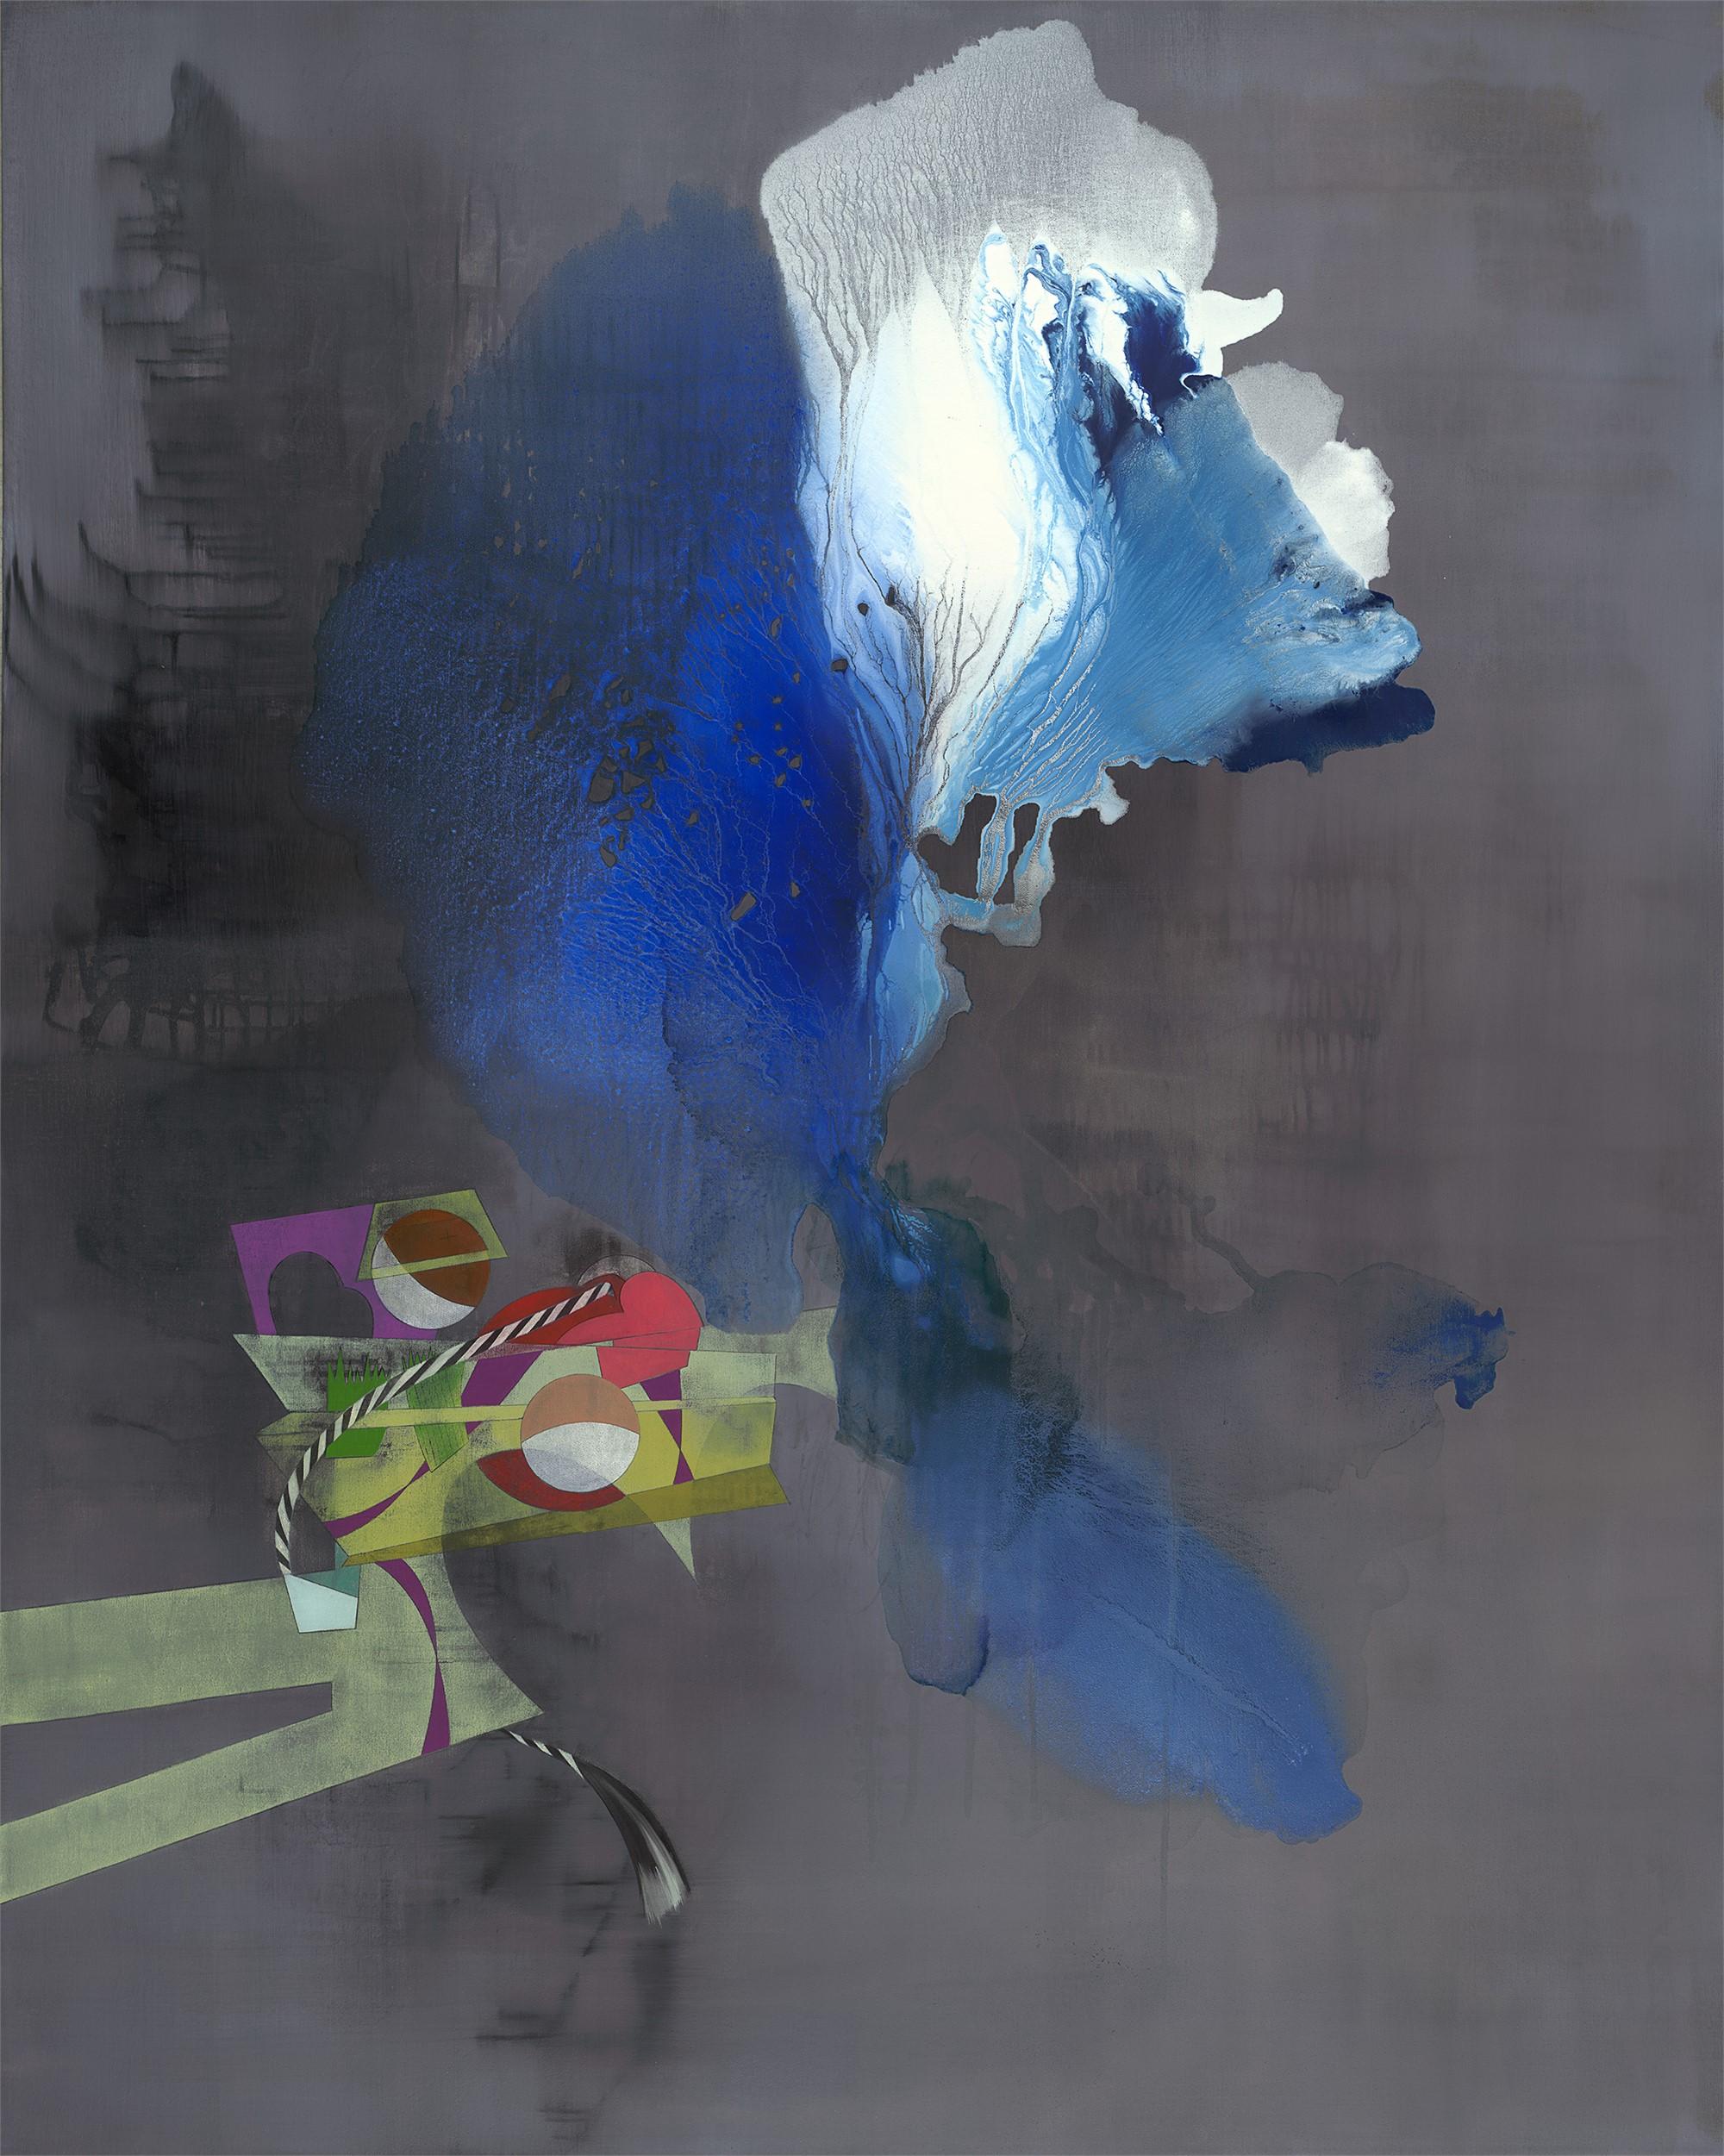 Silicon by Kuzana Ogg